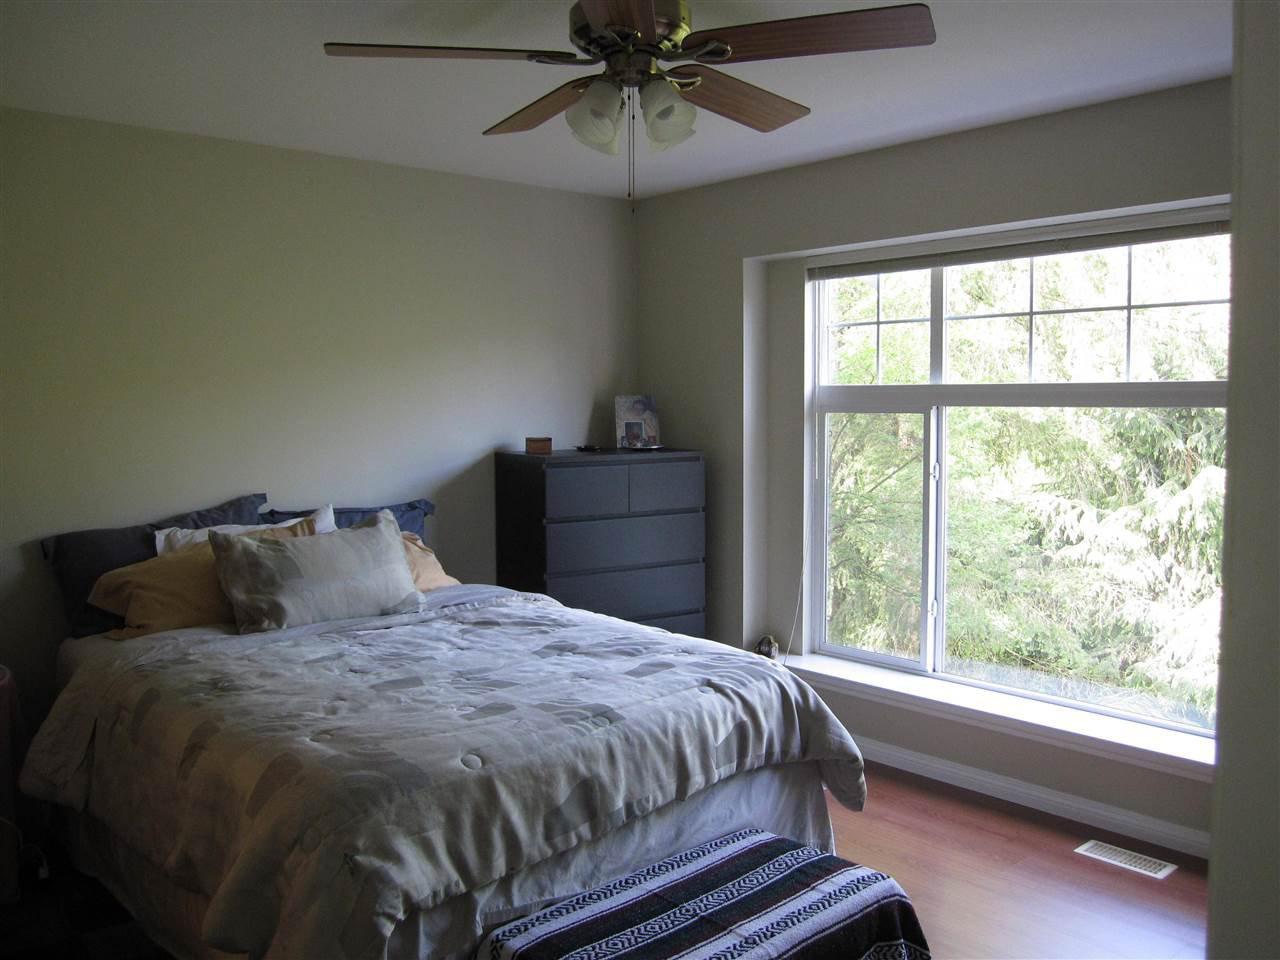 "Photo 8: Photos: 14 23343 KANAKA Way in Maple Ridge: Cottonwood MR Townhouse for sale in ""COTTONWOOD GROVE"" : MLS®# R2164779"